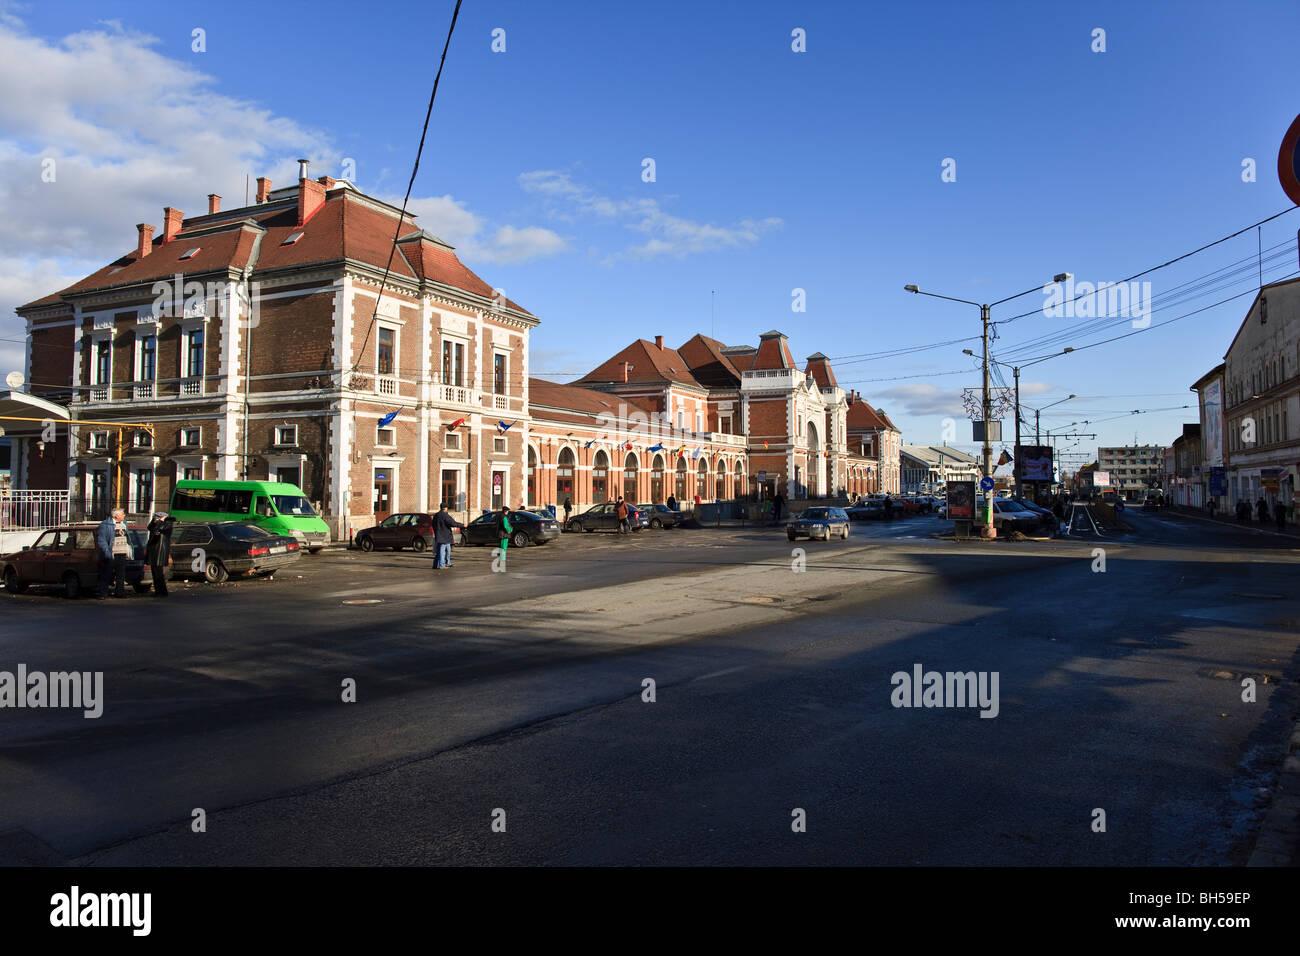 Main station in Cluj-Napoca Romania - Stock Image